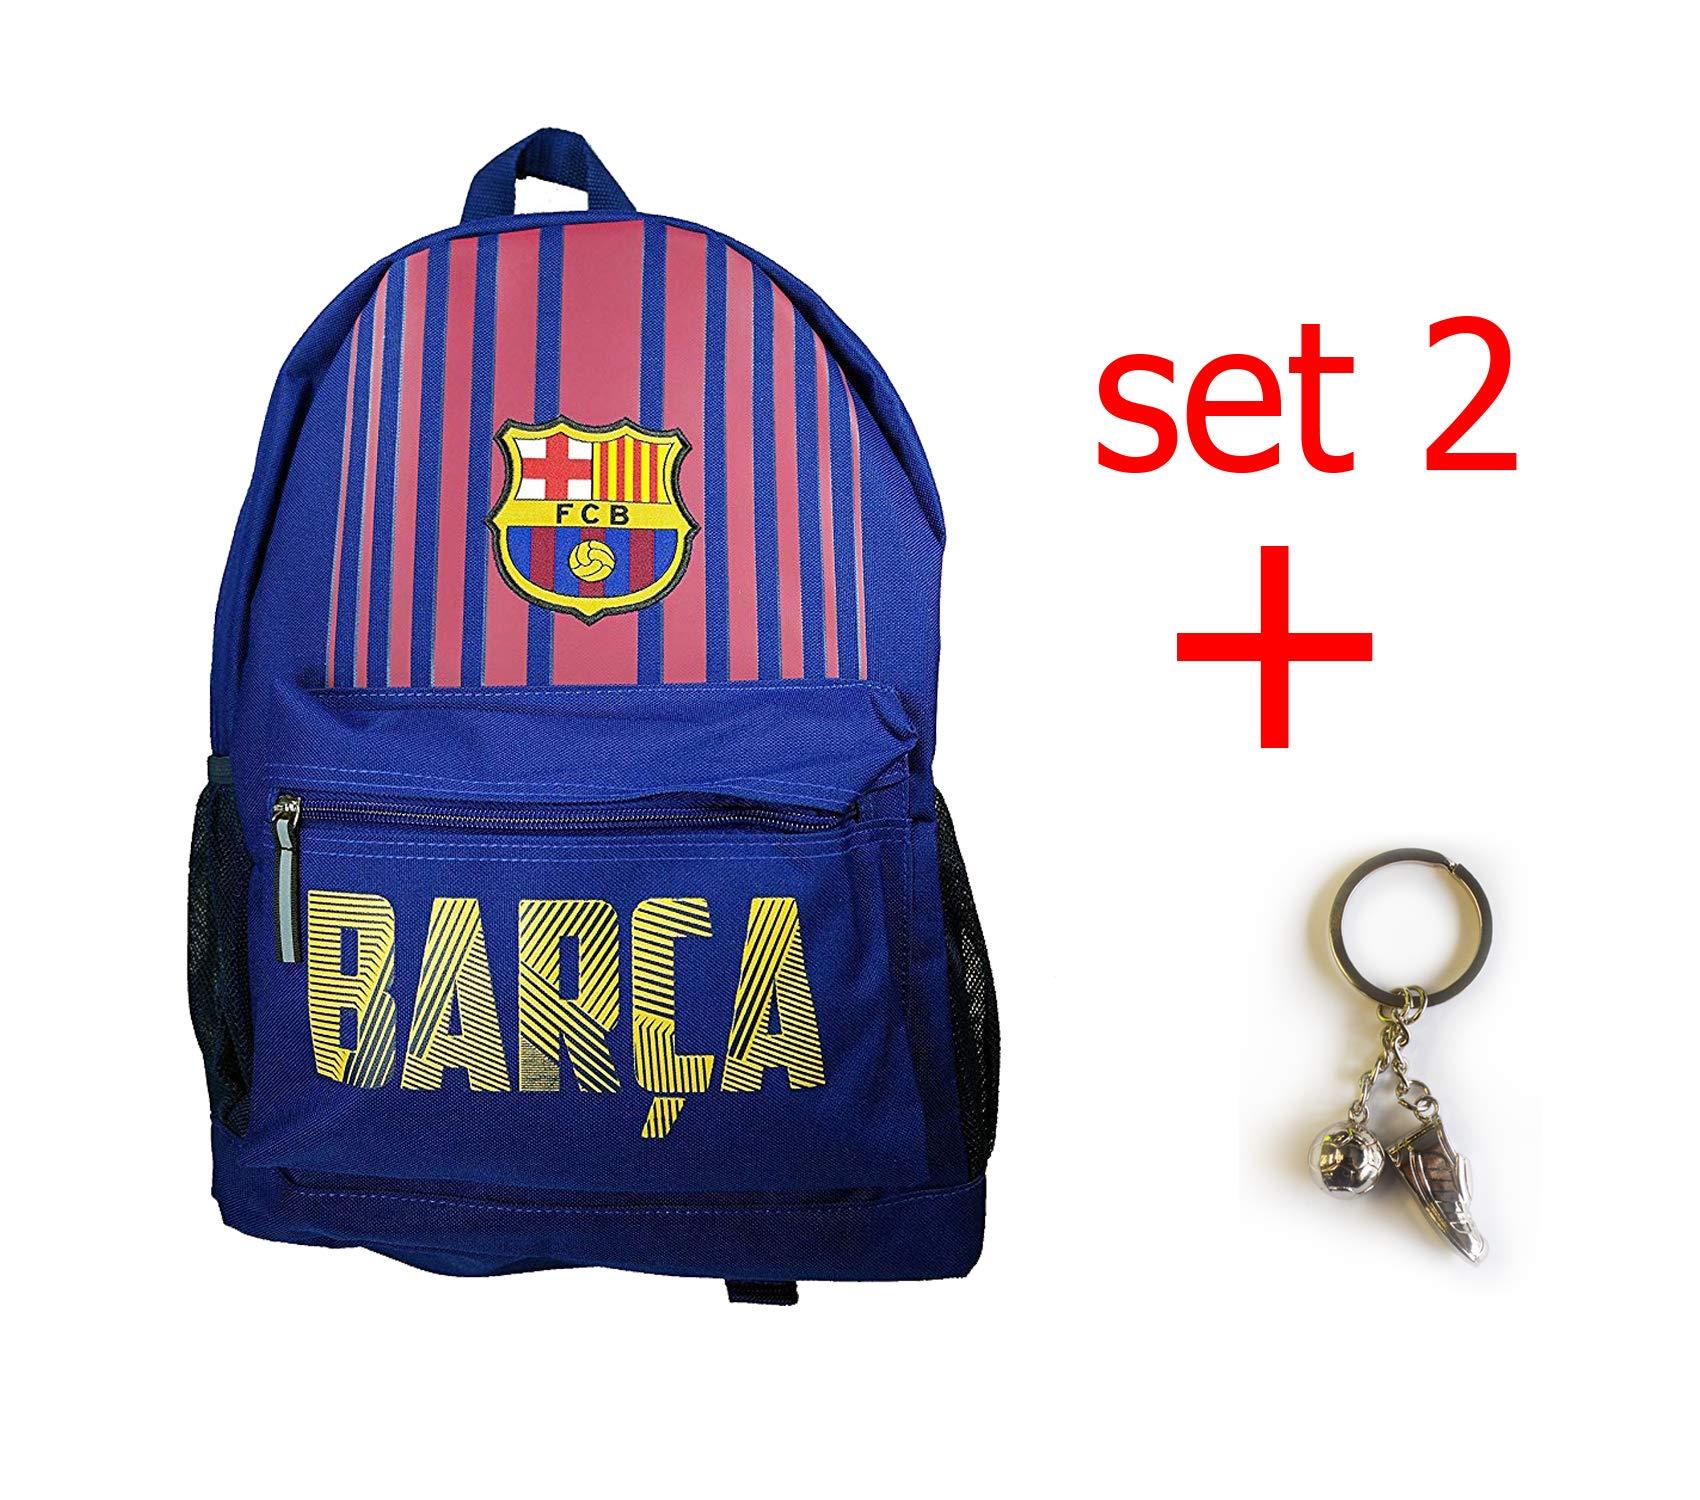 FC Barcelona backpack school mochila bookbag cinch shoe bag official (new Barca set) by F.C. Barcelona (Image #1)